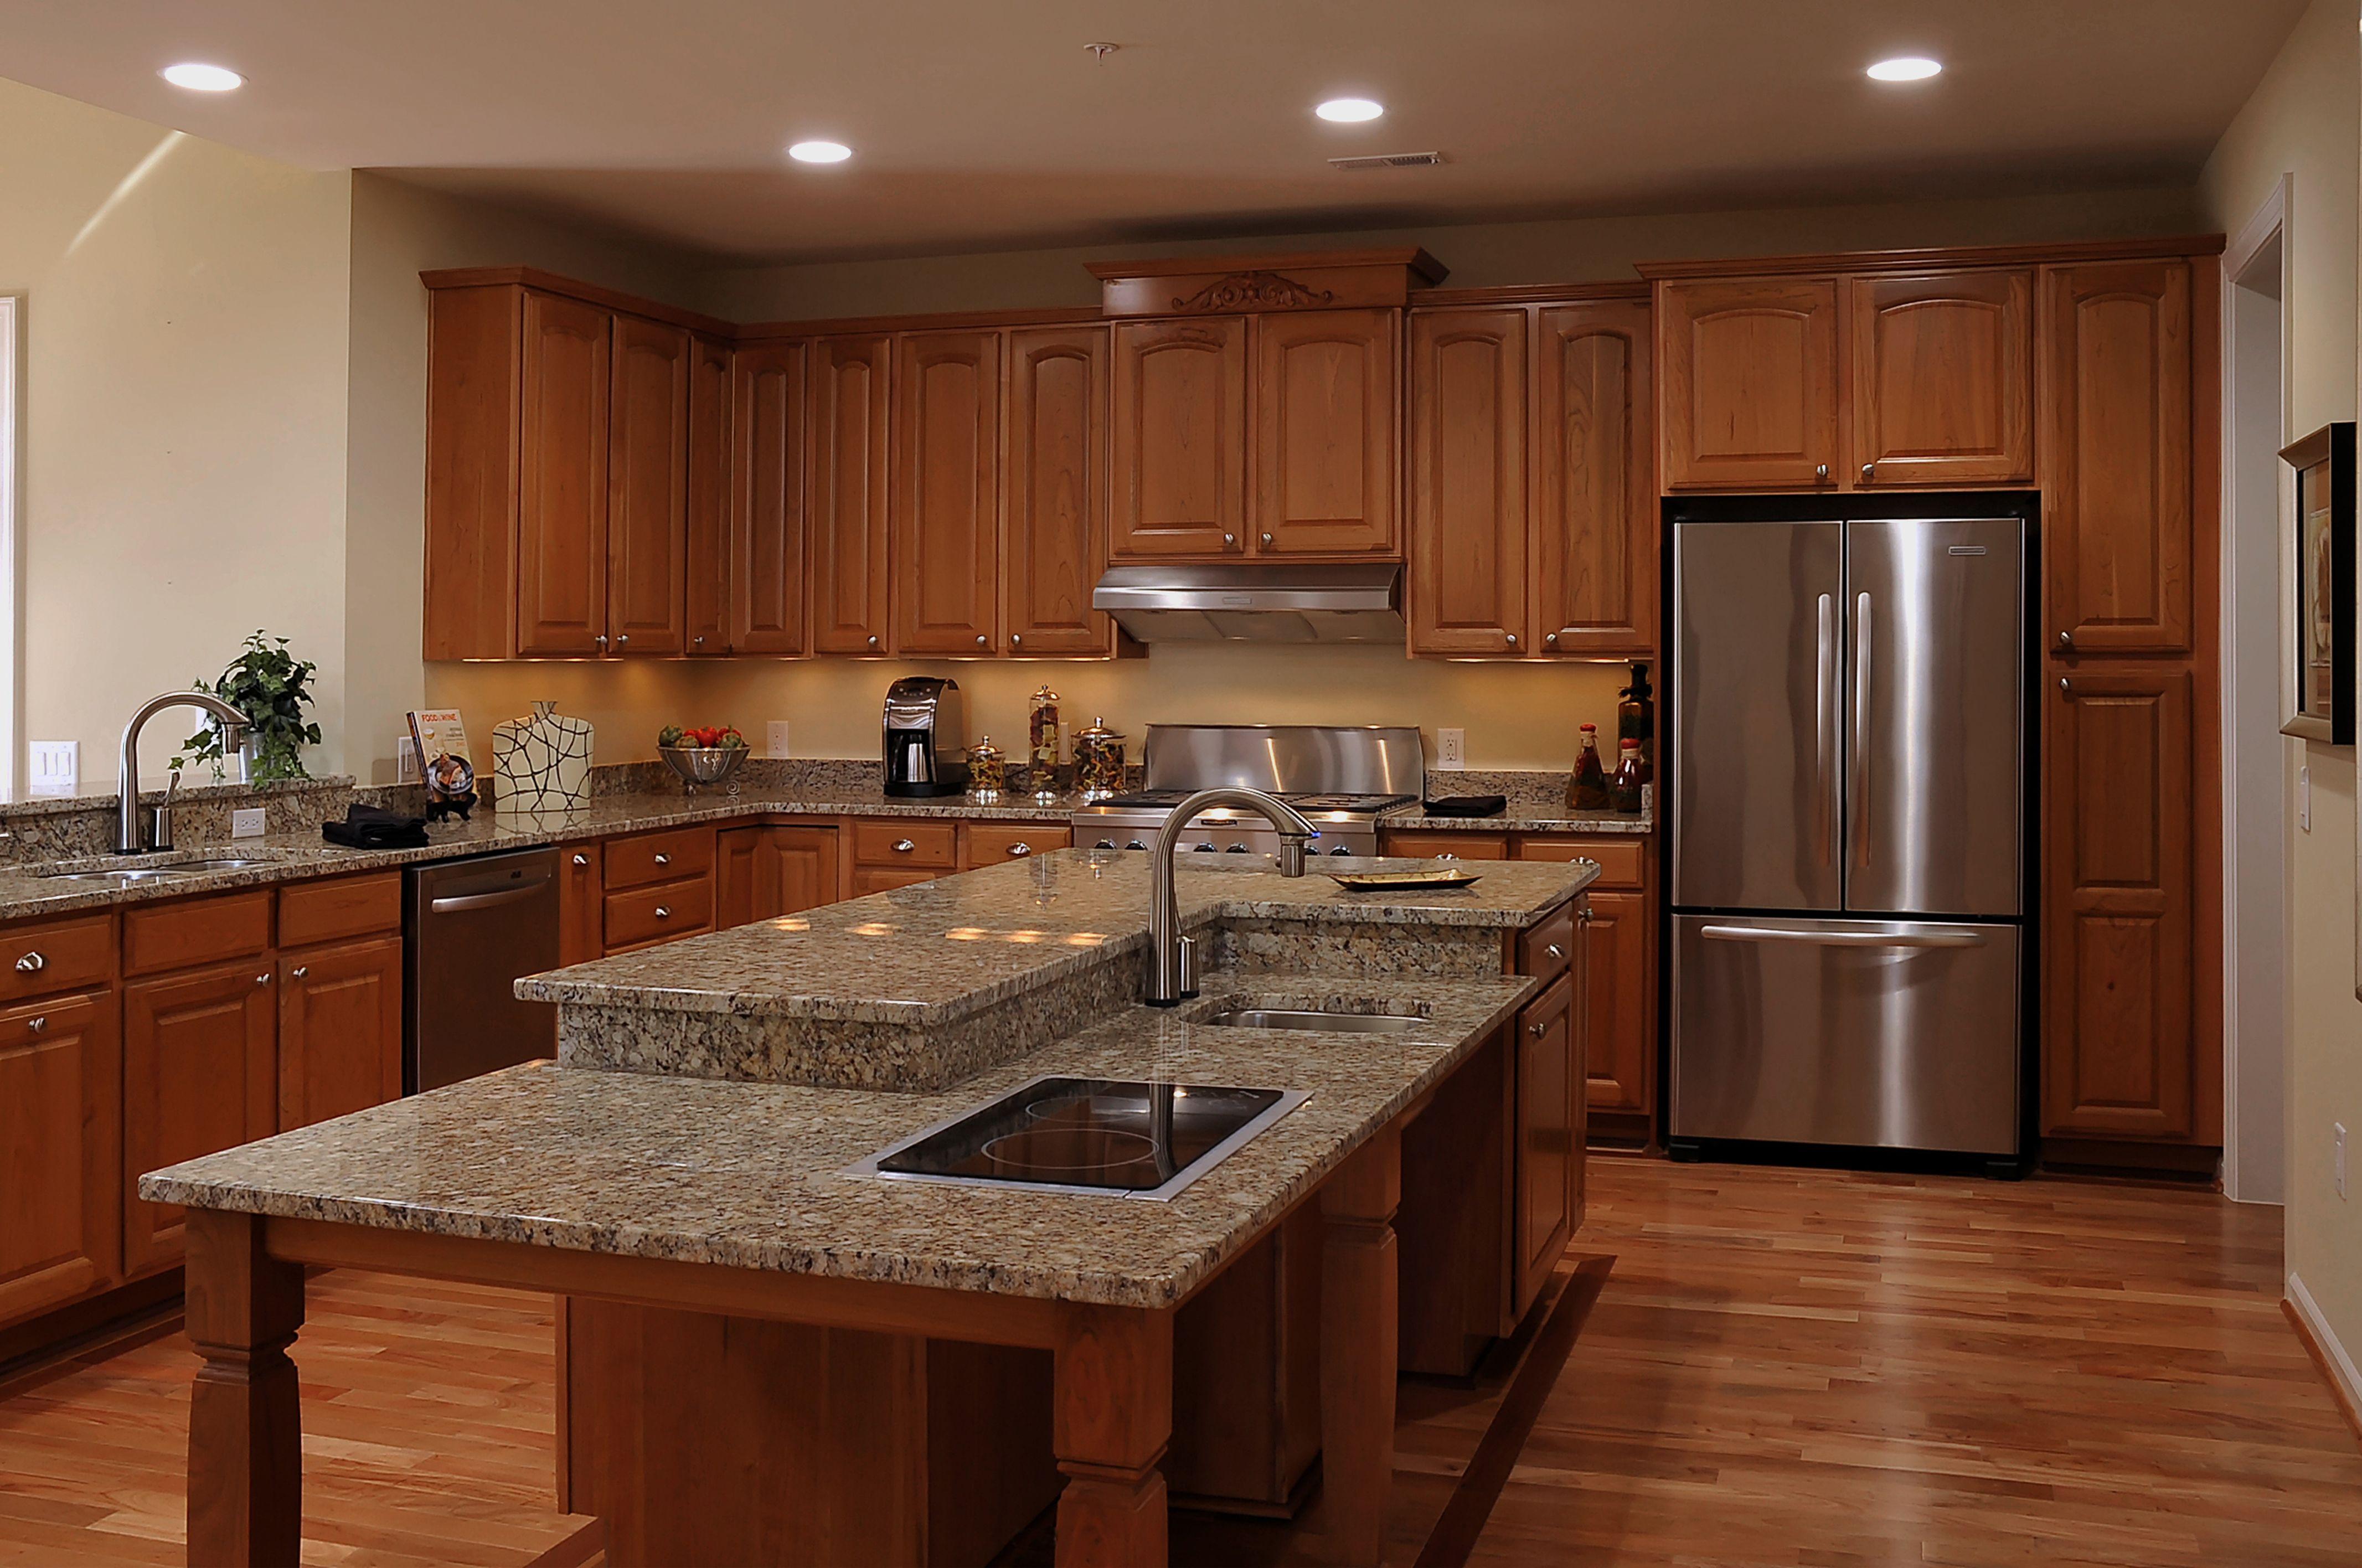 universal design kitchen island kitchen island design kitchen design accessible kitchen on kitchen layouts with island id=49940